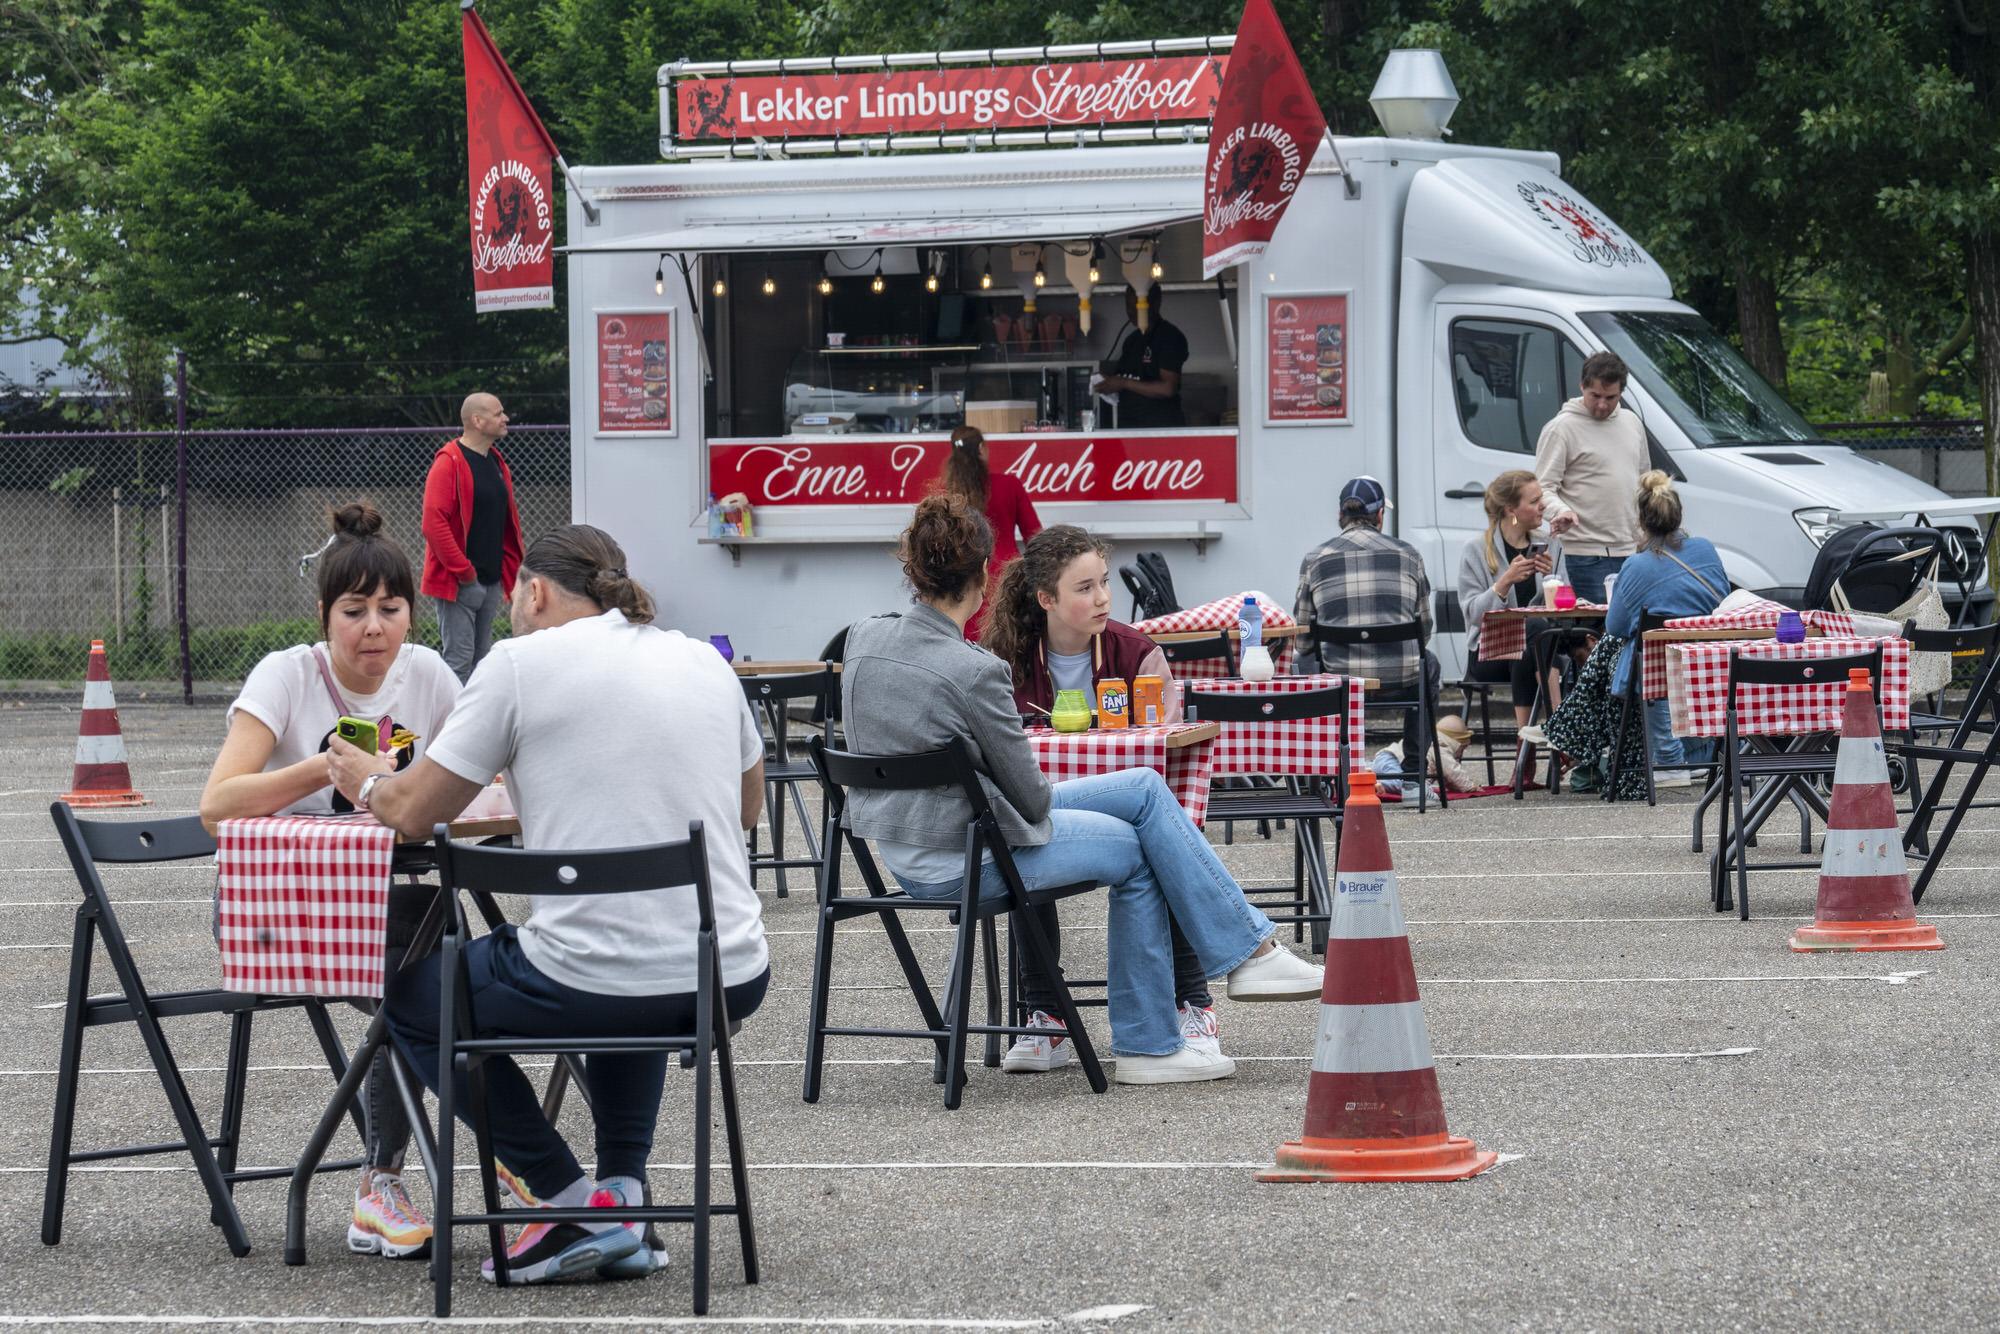 SPIJS-foodfestival-5juni21-00046.jpg